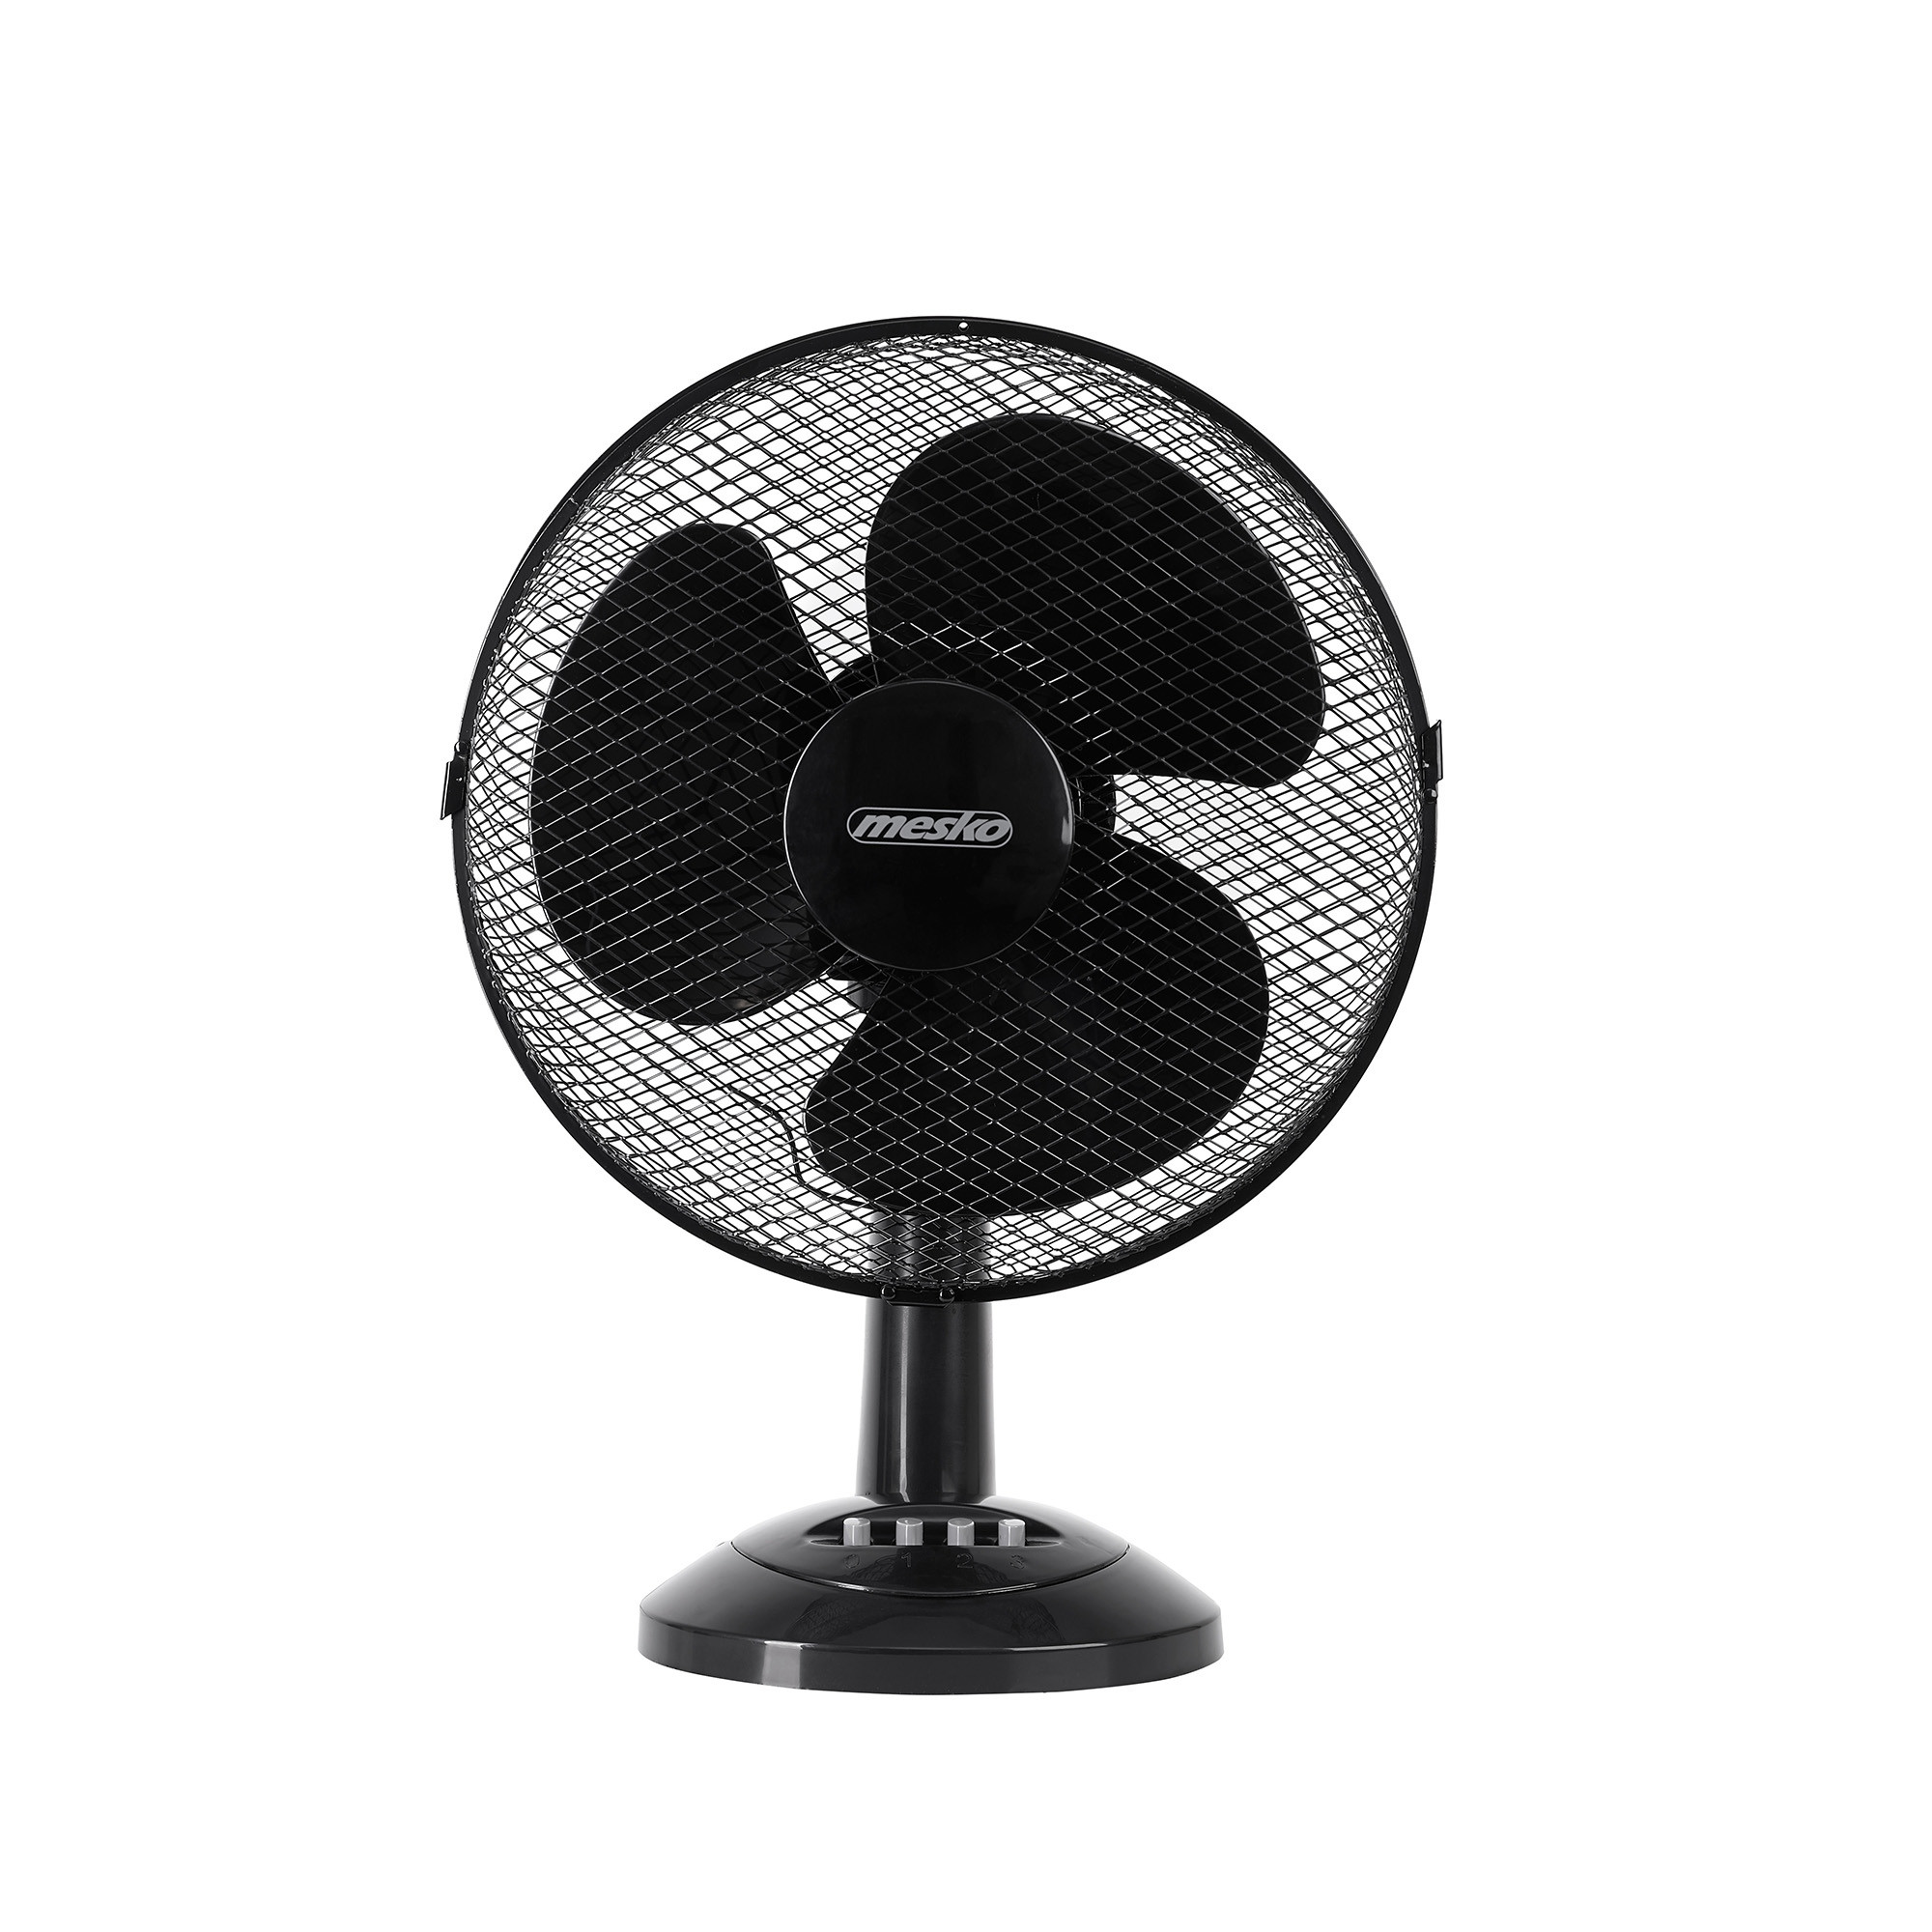 Mesko MS7309 Ventilador de Mesa oscilante, Inclinable, 30 cm, 3 velocidades, Negro, 70W